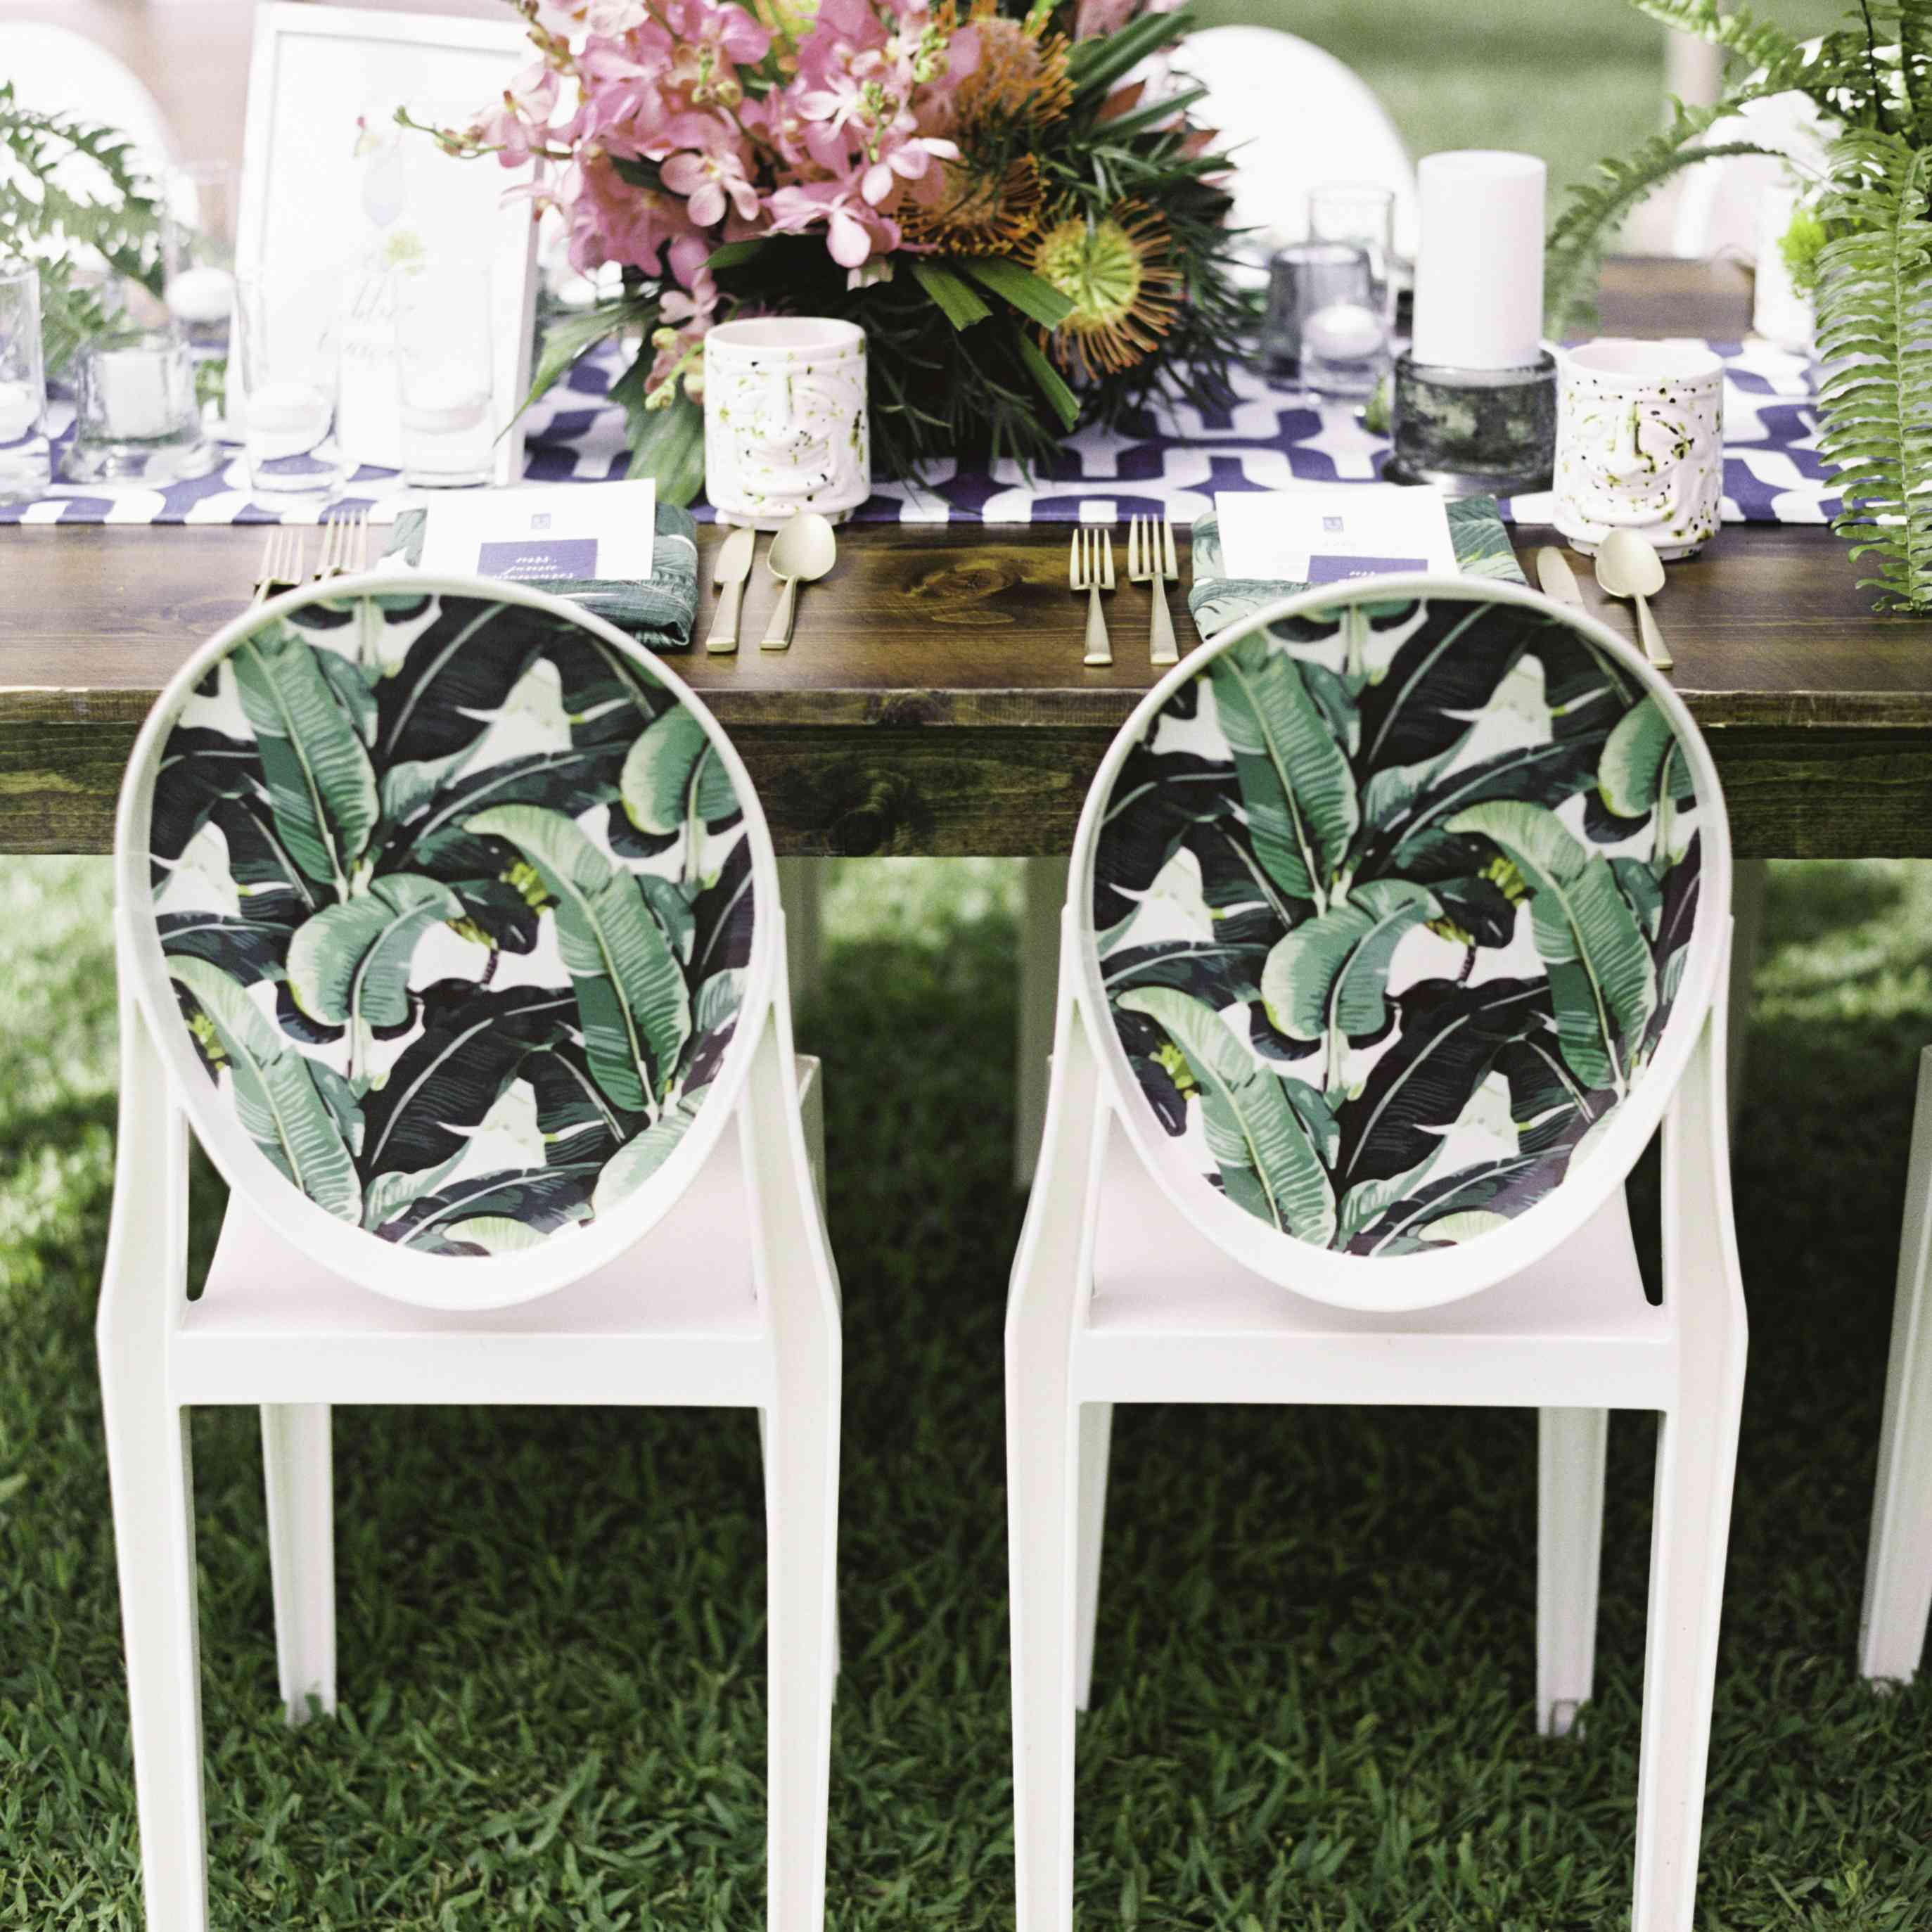 Palm-Print Chairs